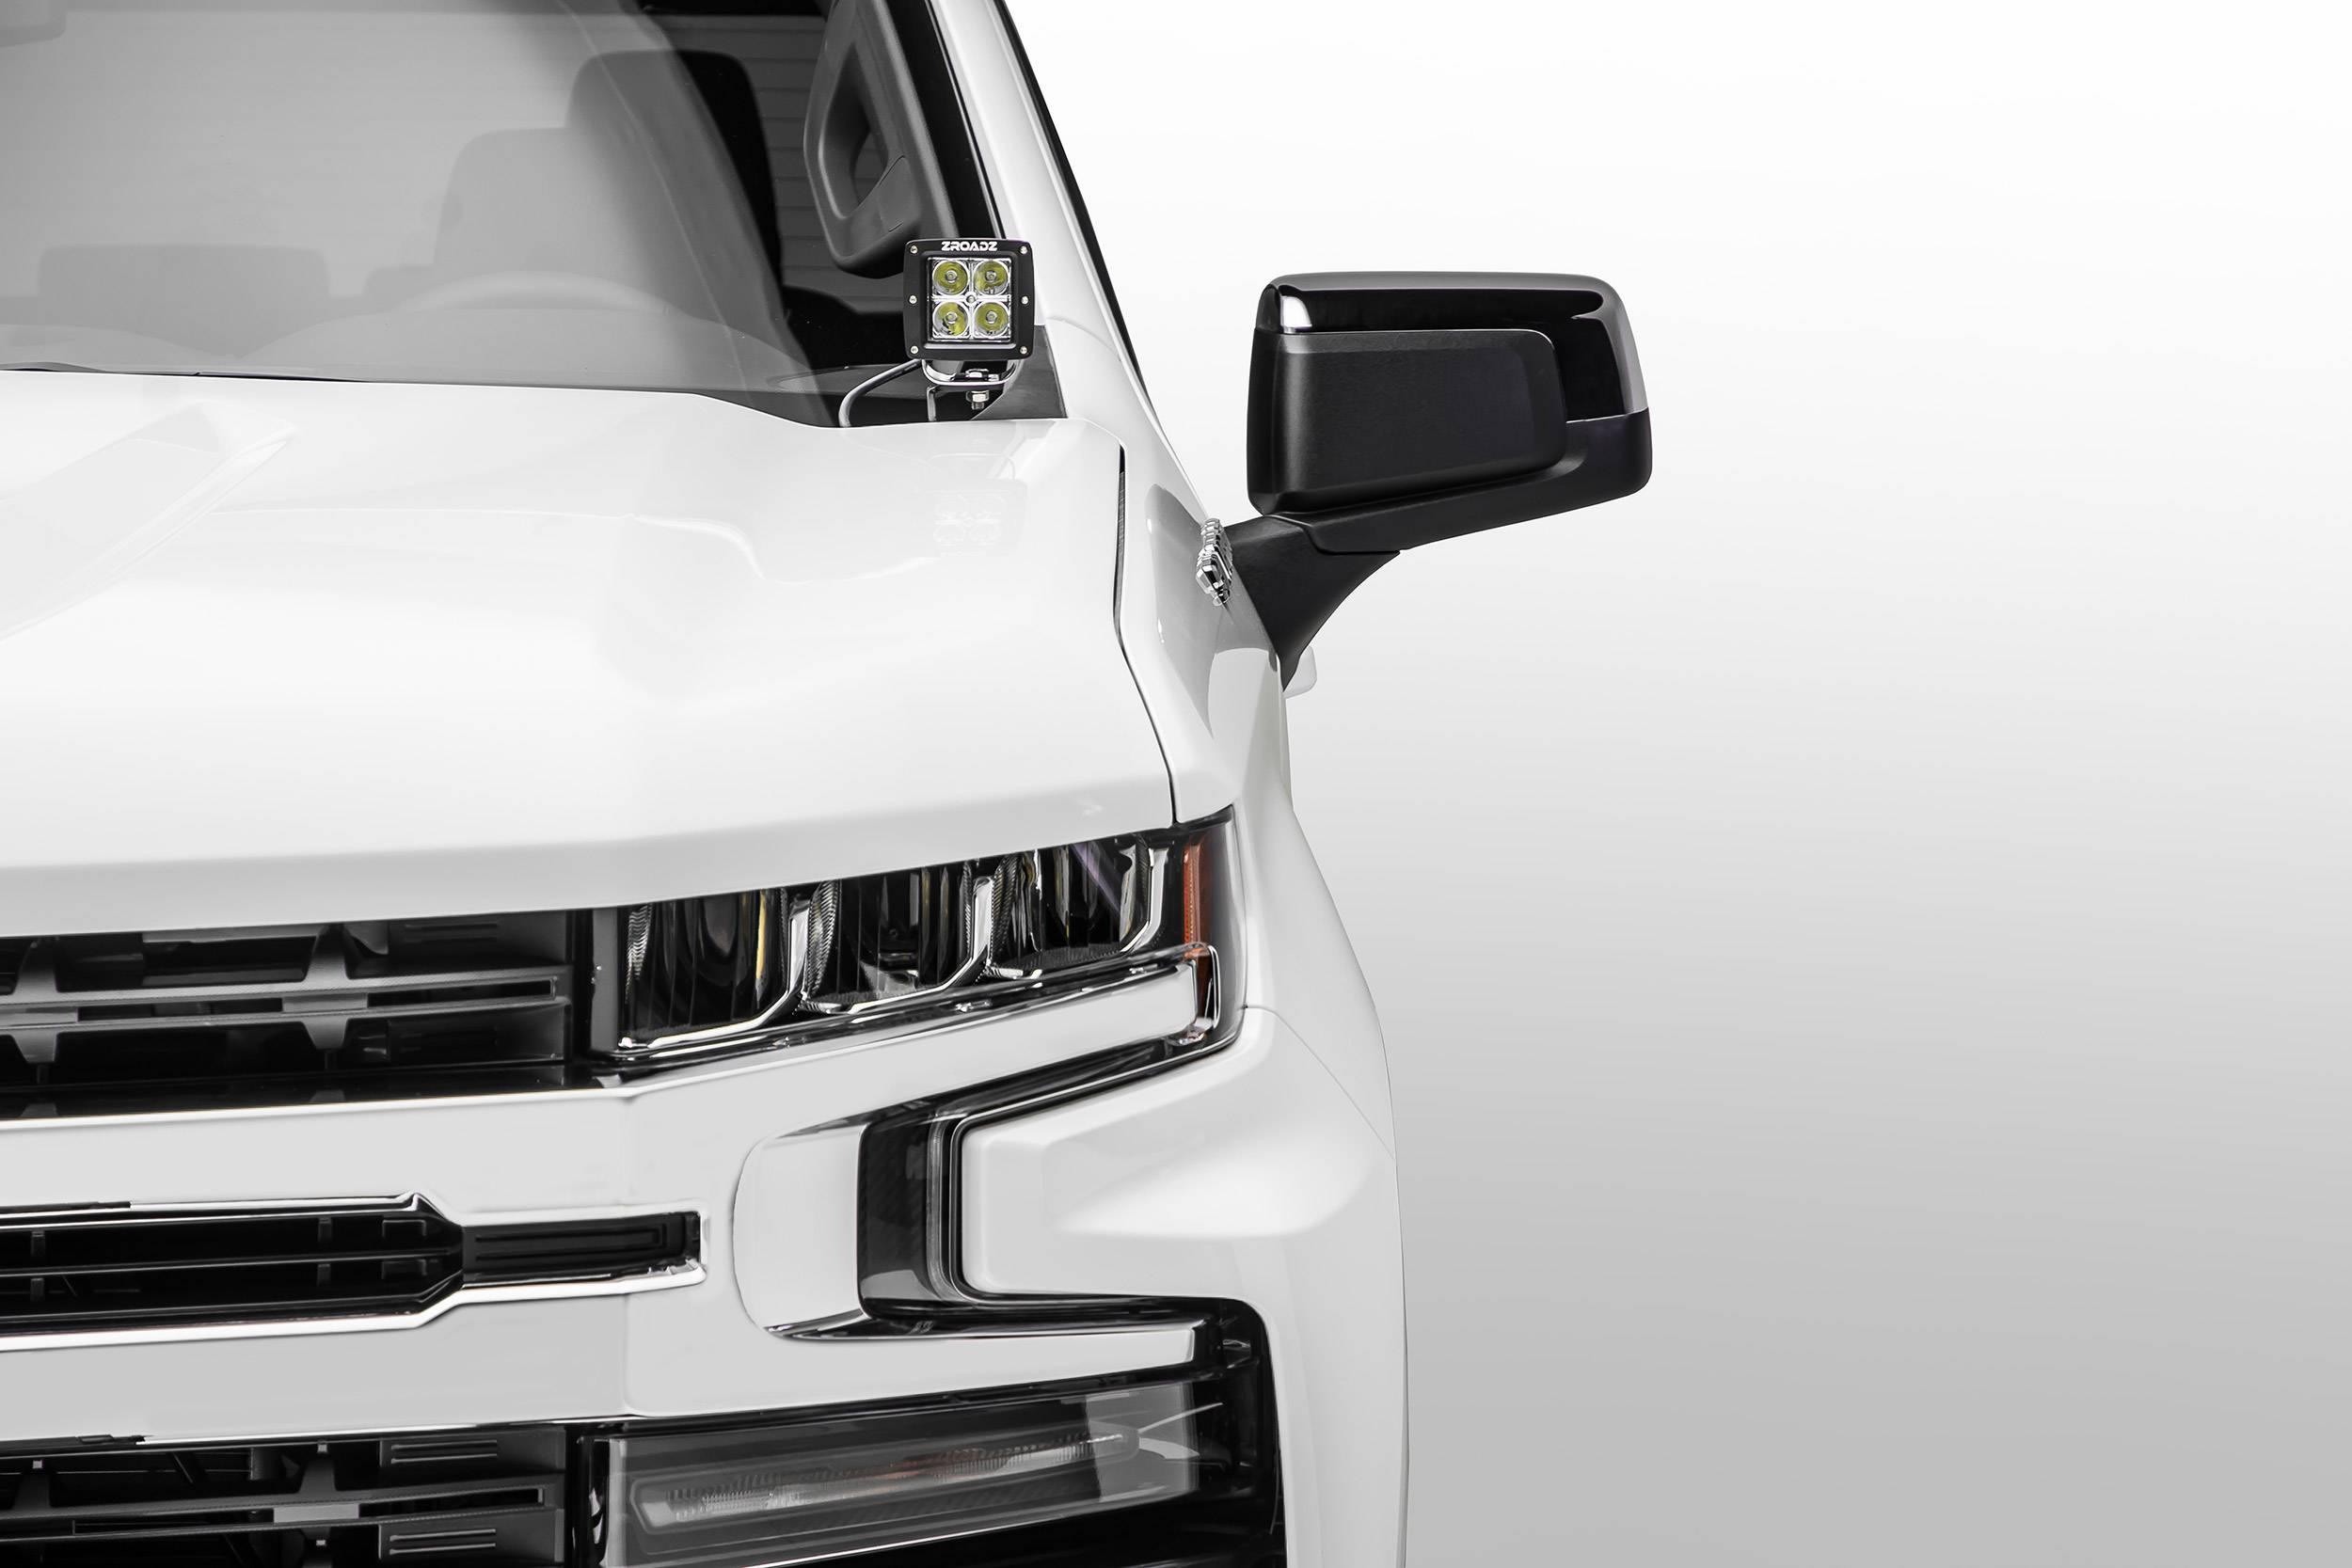 2019 Chevrolet Silverado 1500 Hood Hinge LED Kit  Incl. (2) 3 Inch LED Pod Lights - PN #Z362181-KIT2